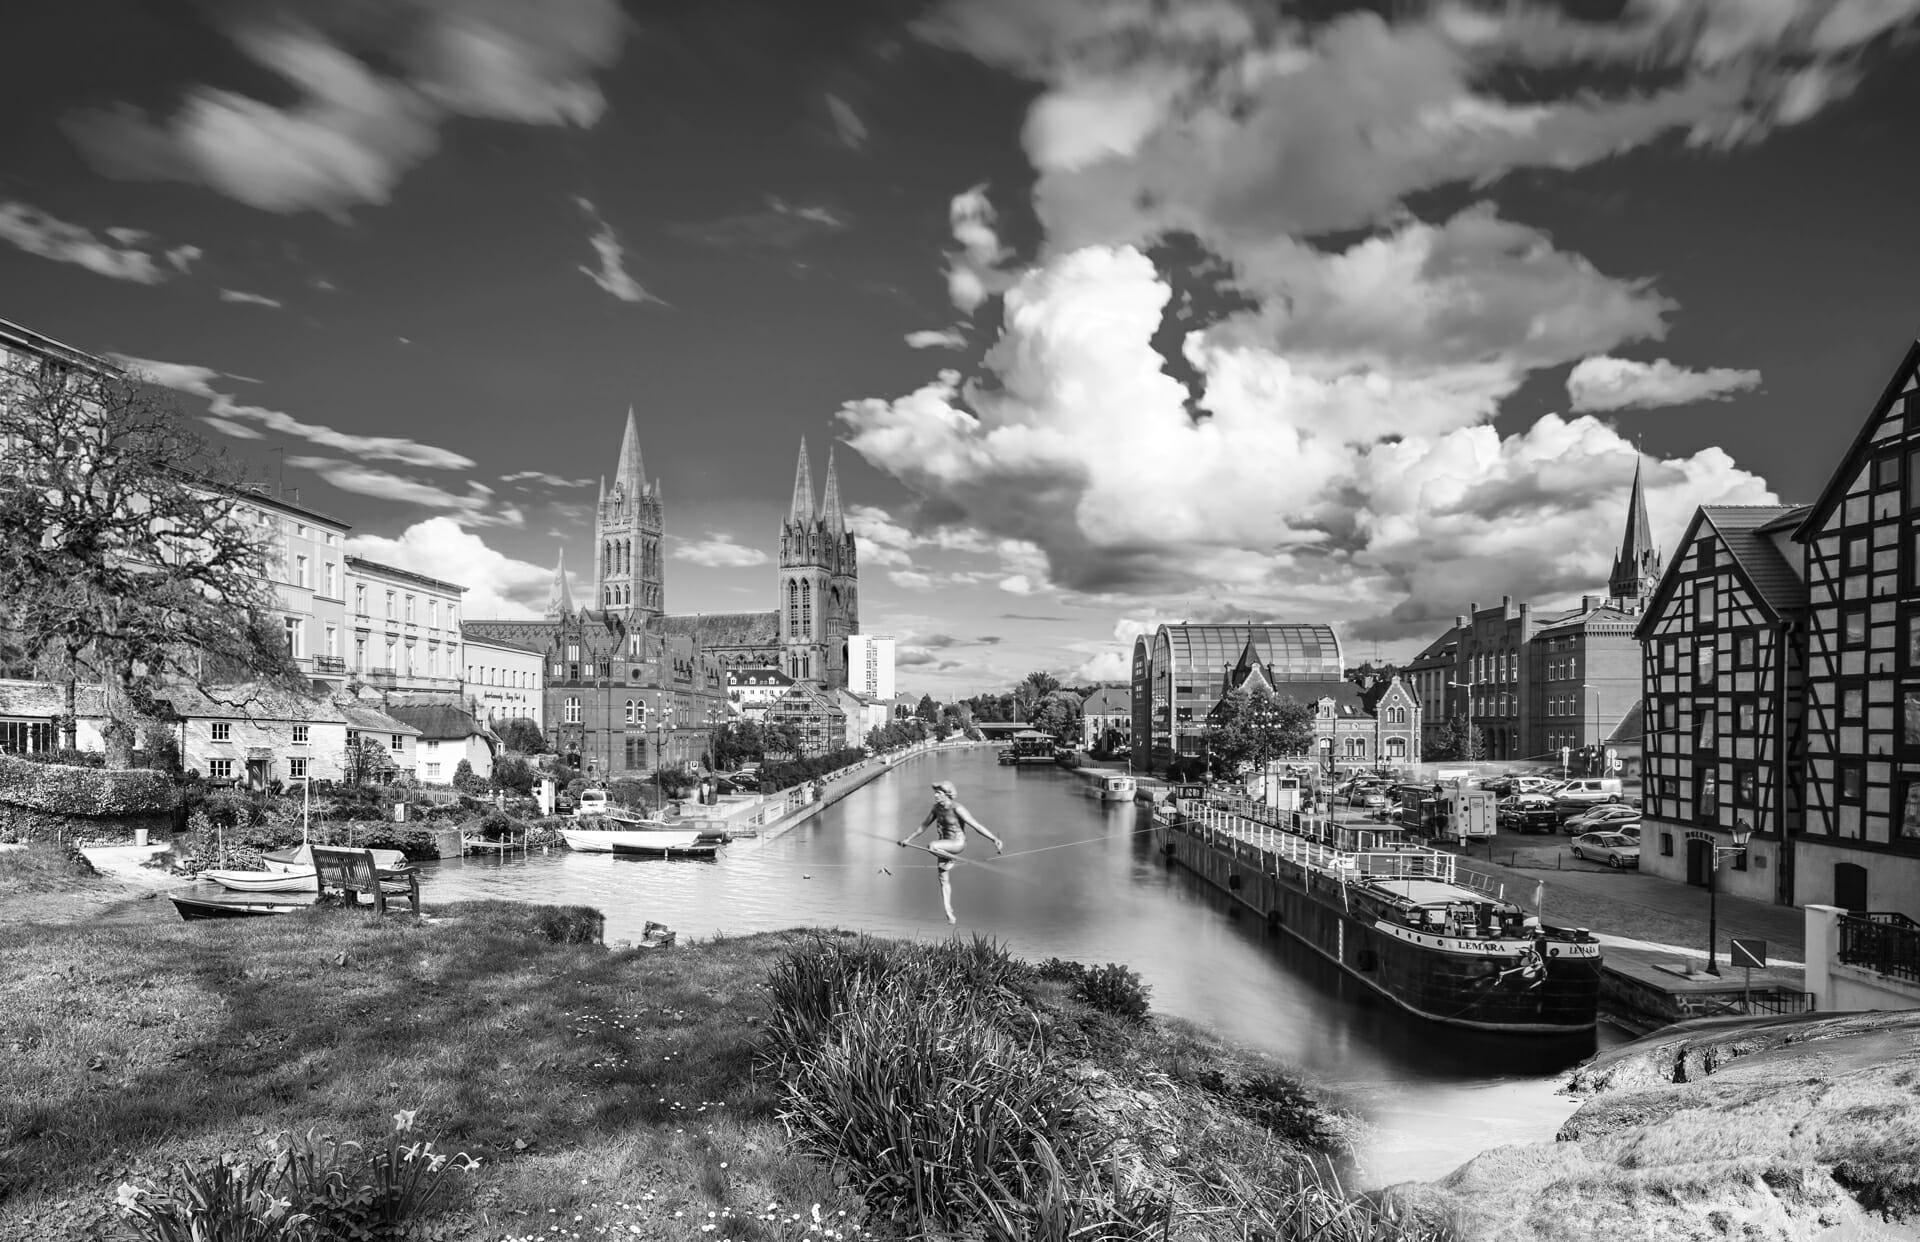 Combined image of Bydgoszcz & Truro